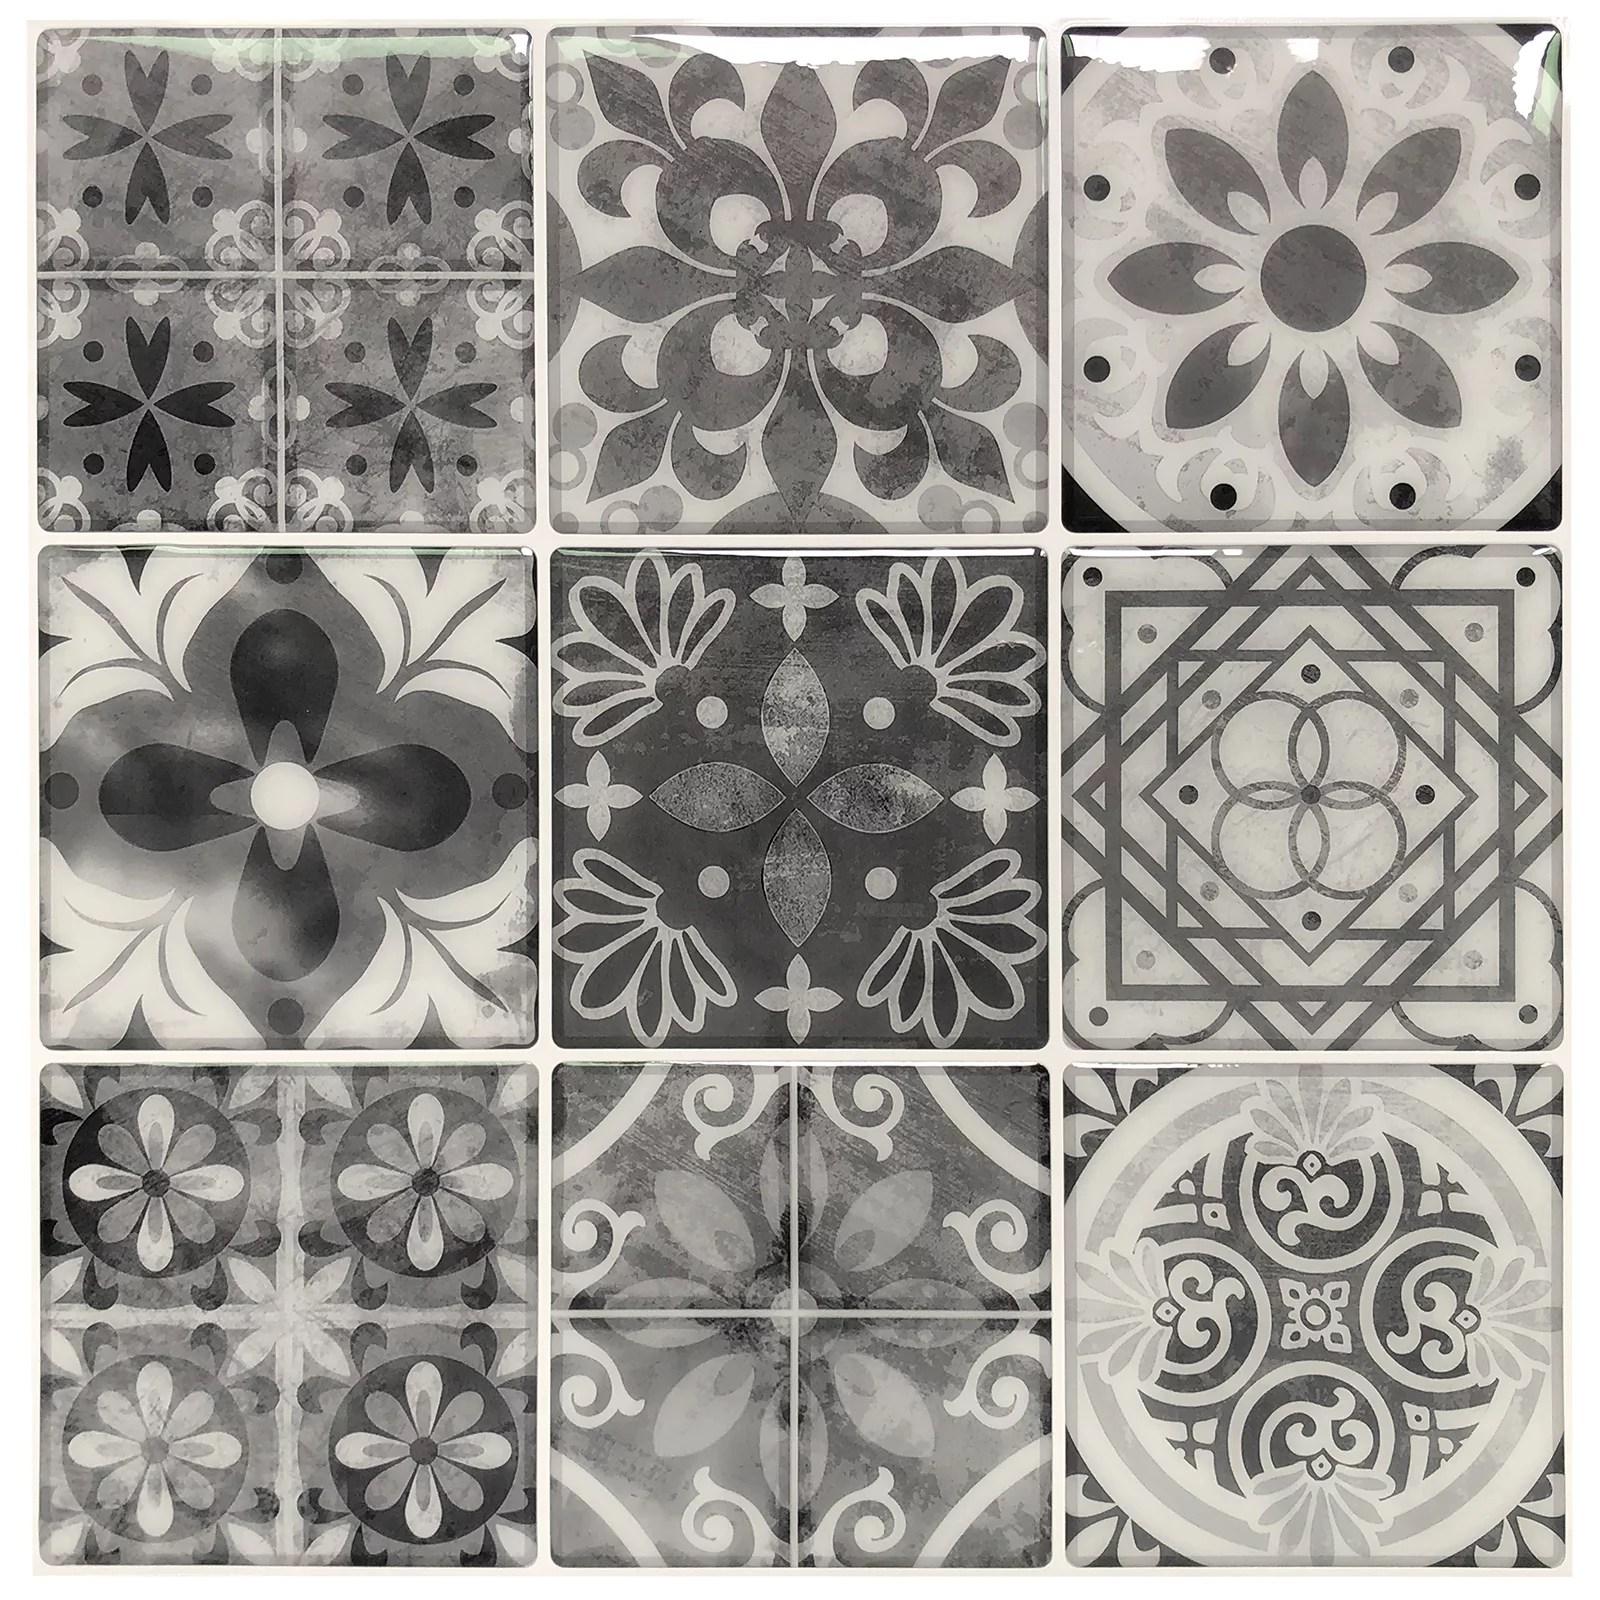 longking peel and stick wall tile backsplash tile gray talavera 12 in x 12 in 10 pack walmart com